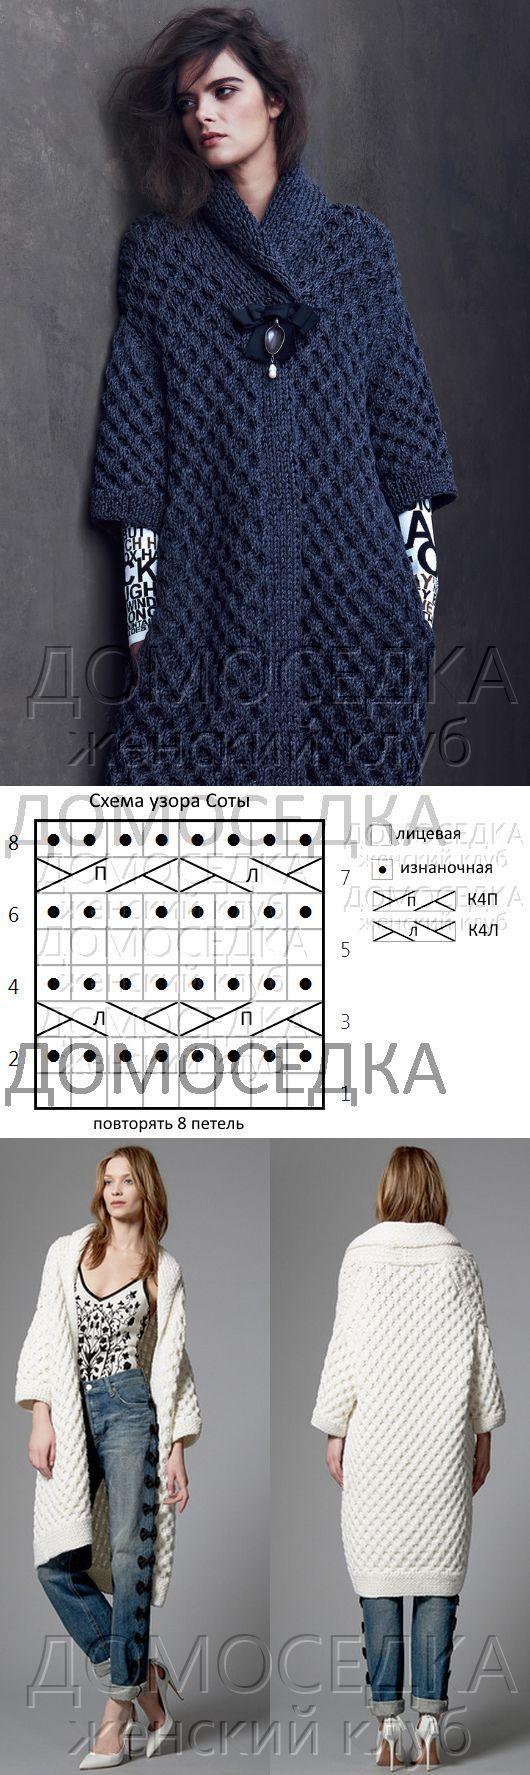 domosed-ka.ru